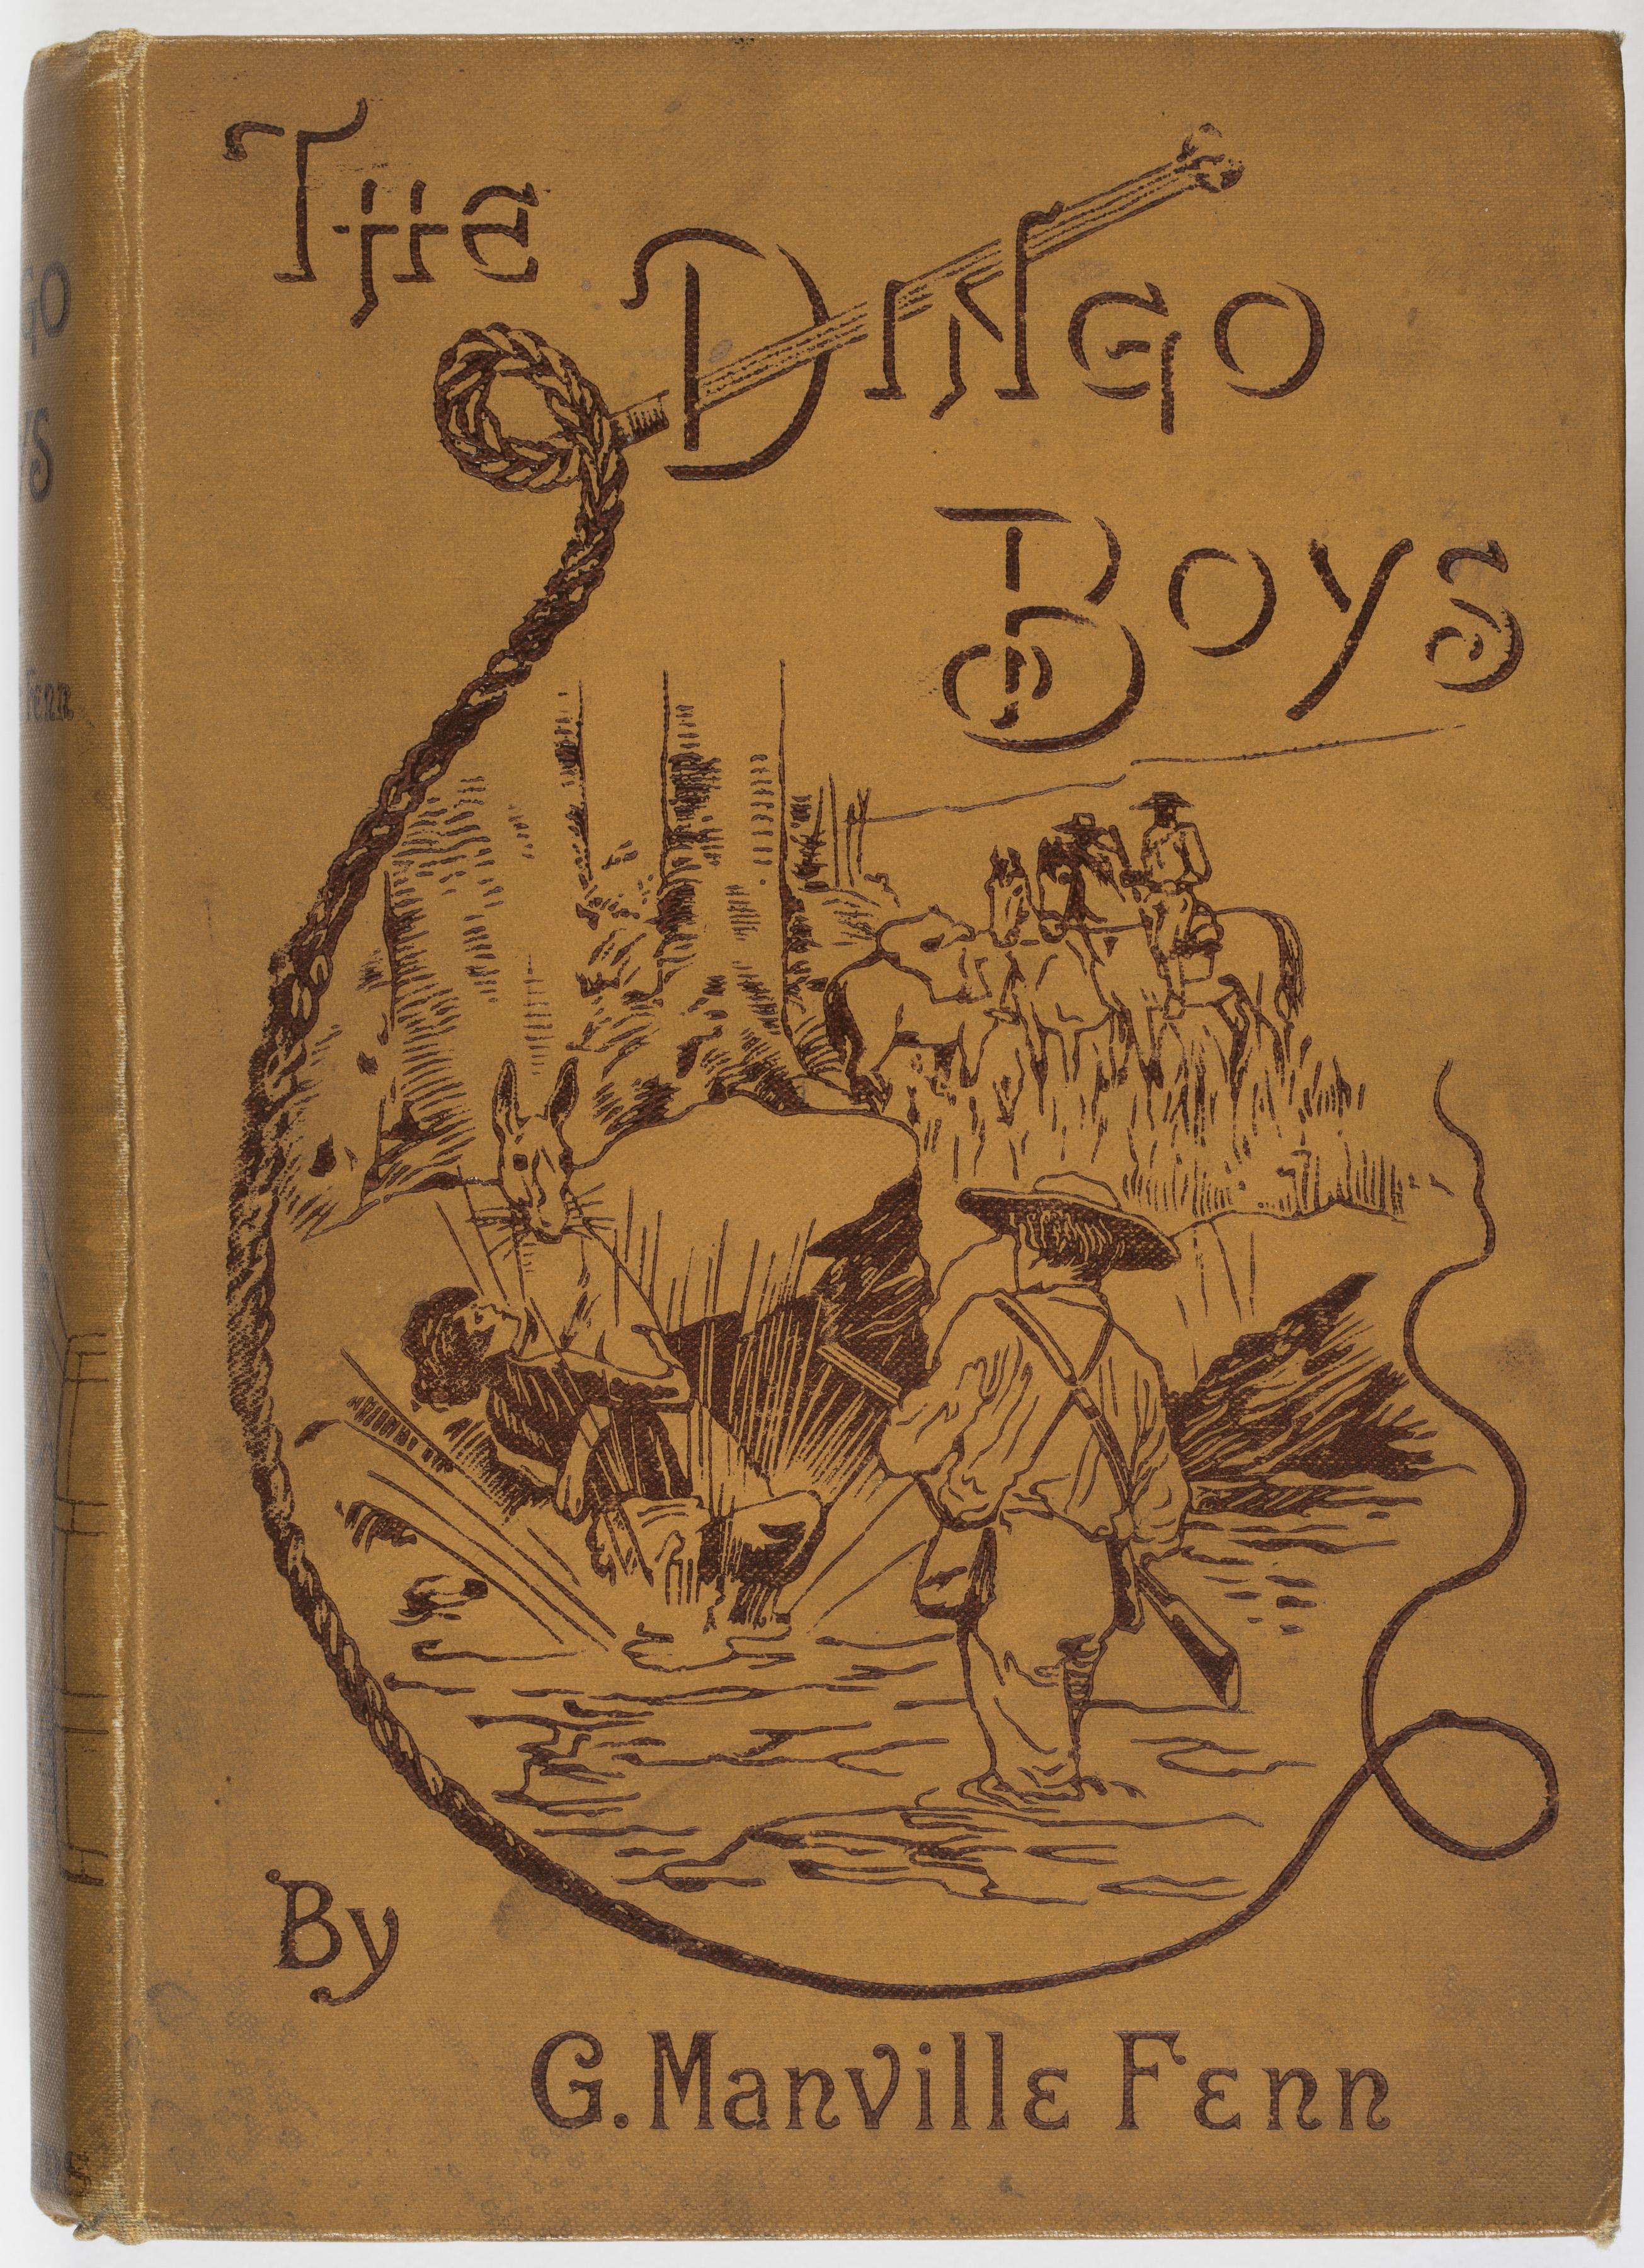 Cover of the The Dingo Boys Book